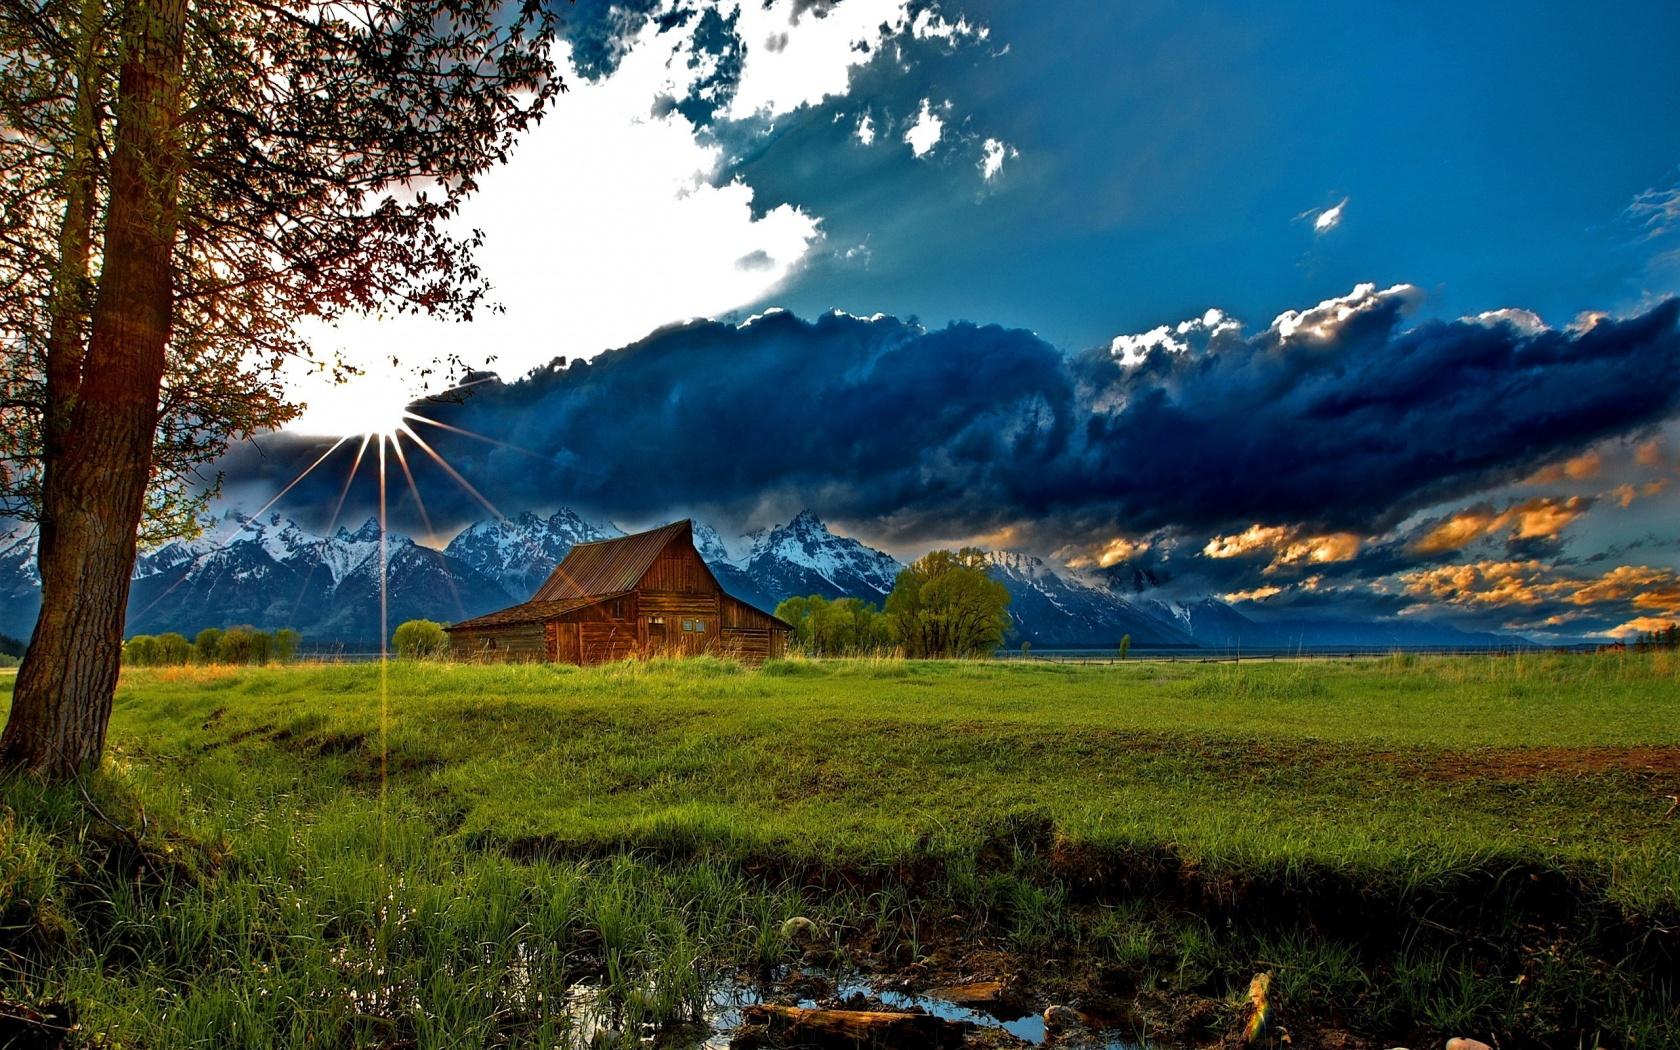 Mountain Cabin 1680 x 1050 Download Close 1680x1050